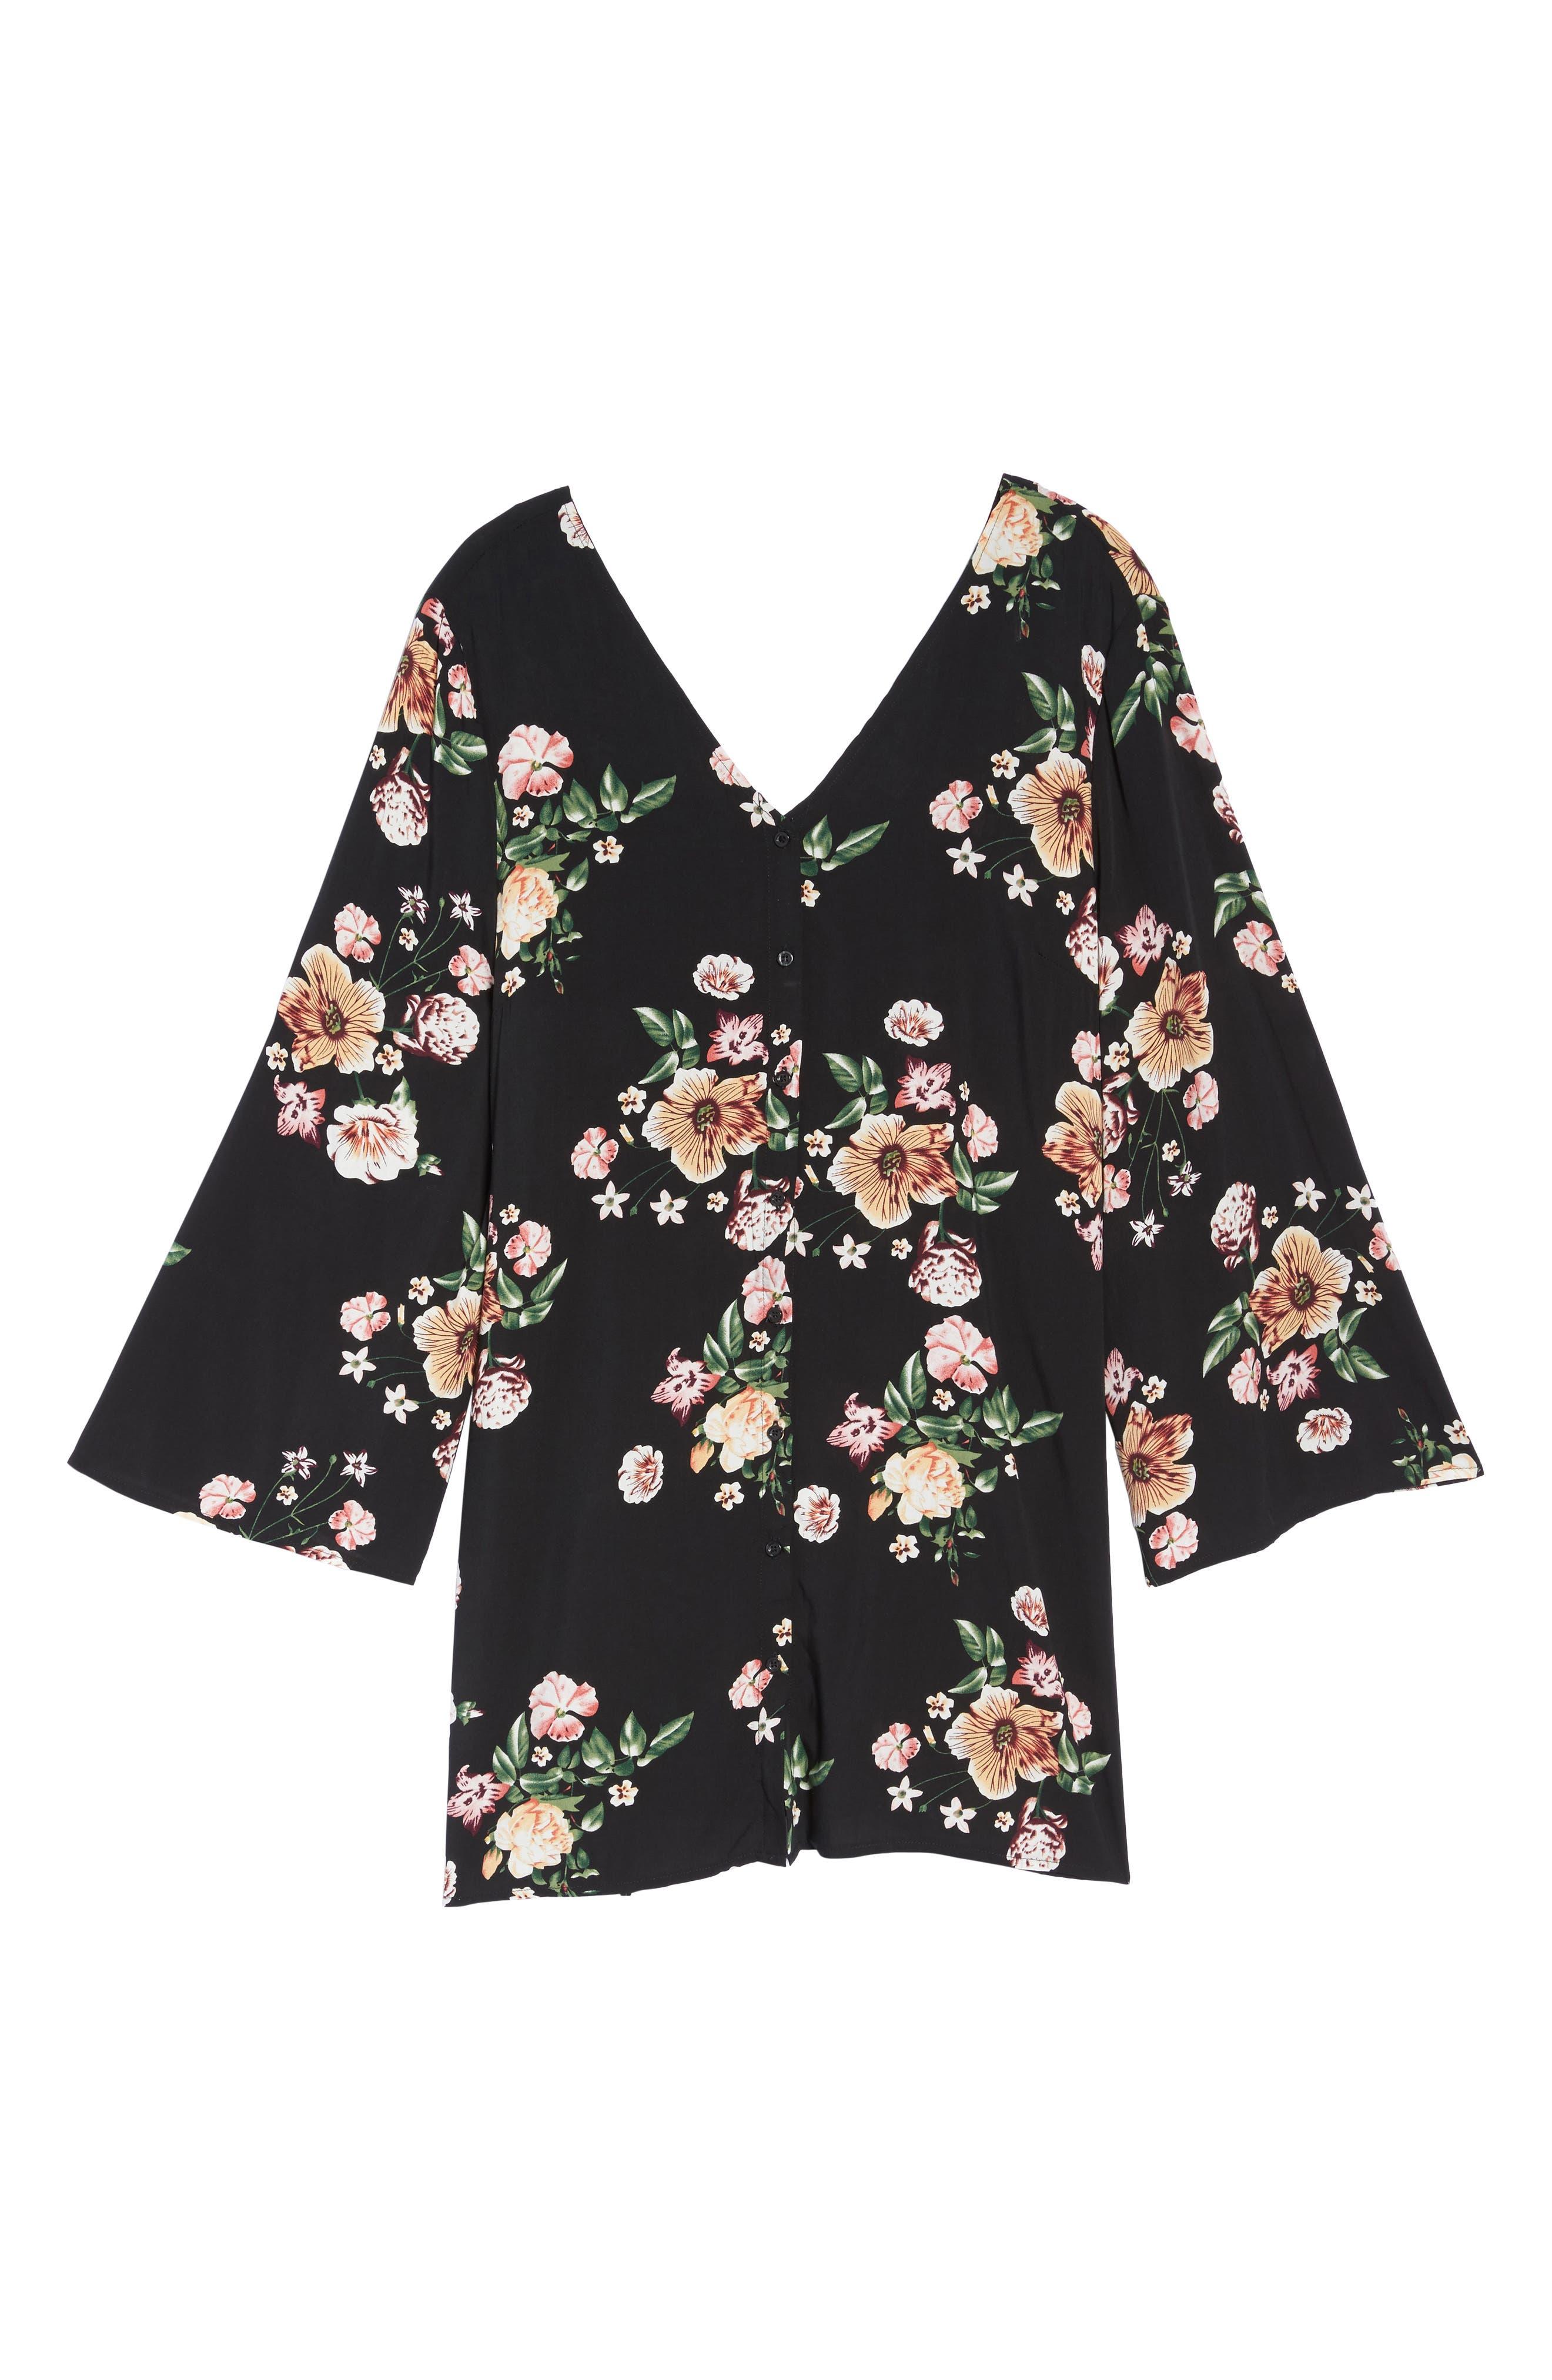 Bell Sleeve Floral Shift Dress,                             Alternate thumbnail 6, color,                             Black Tropic Flower